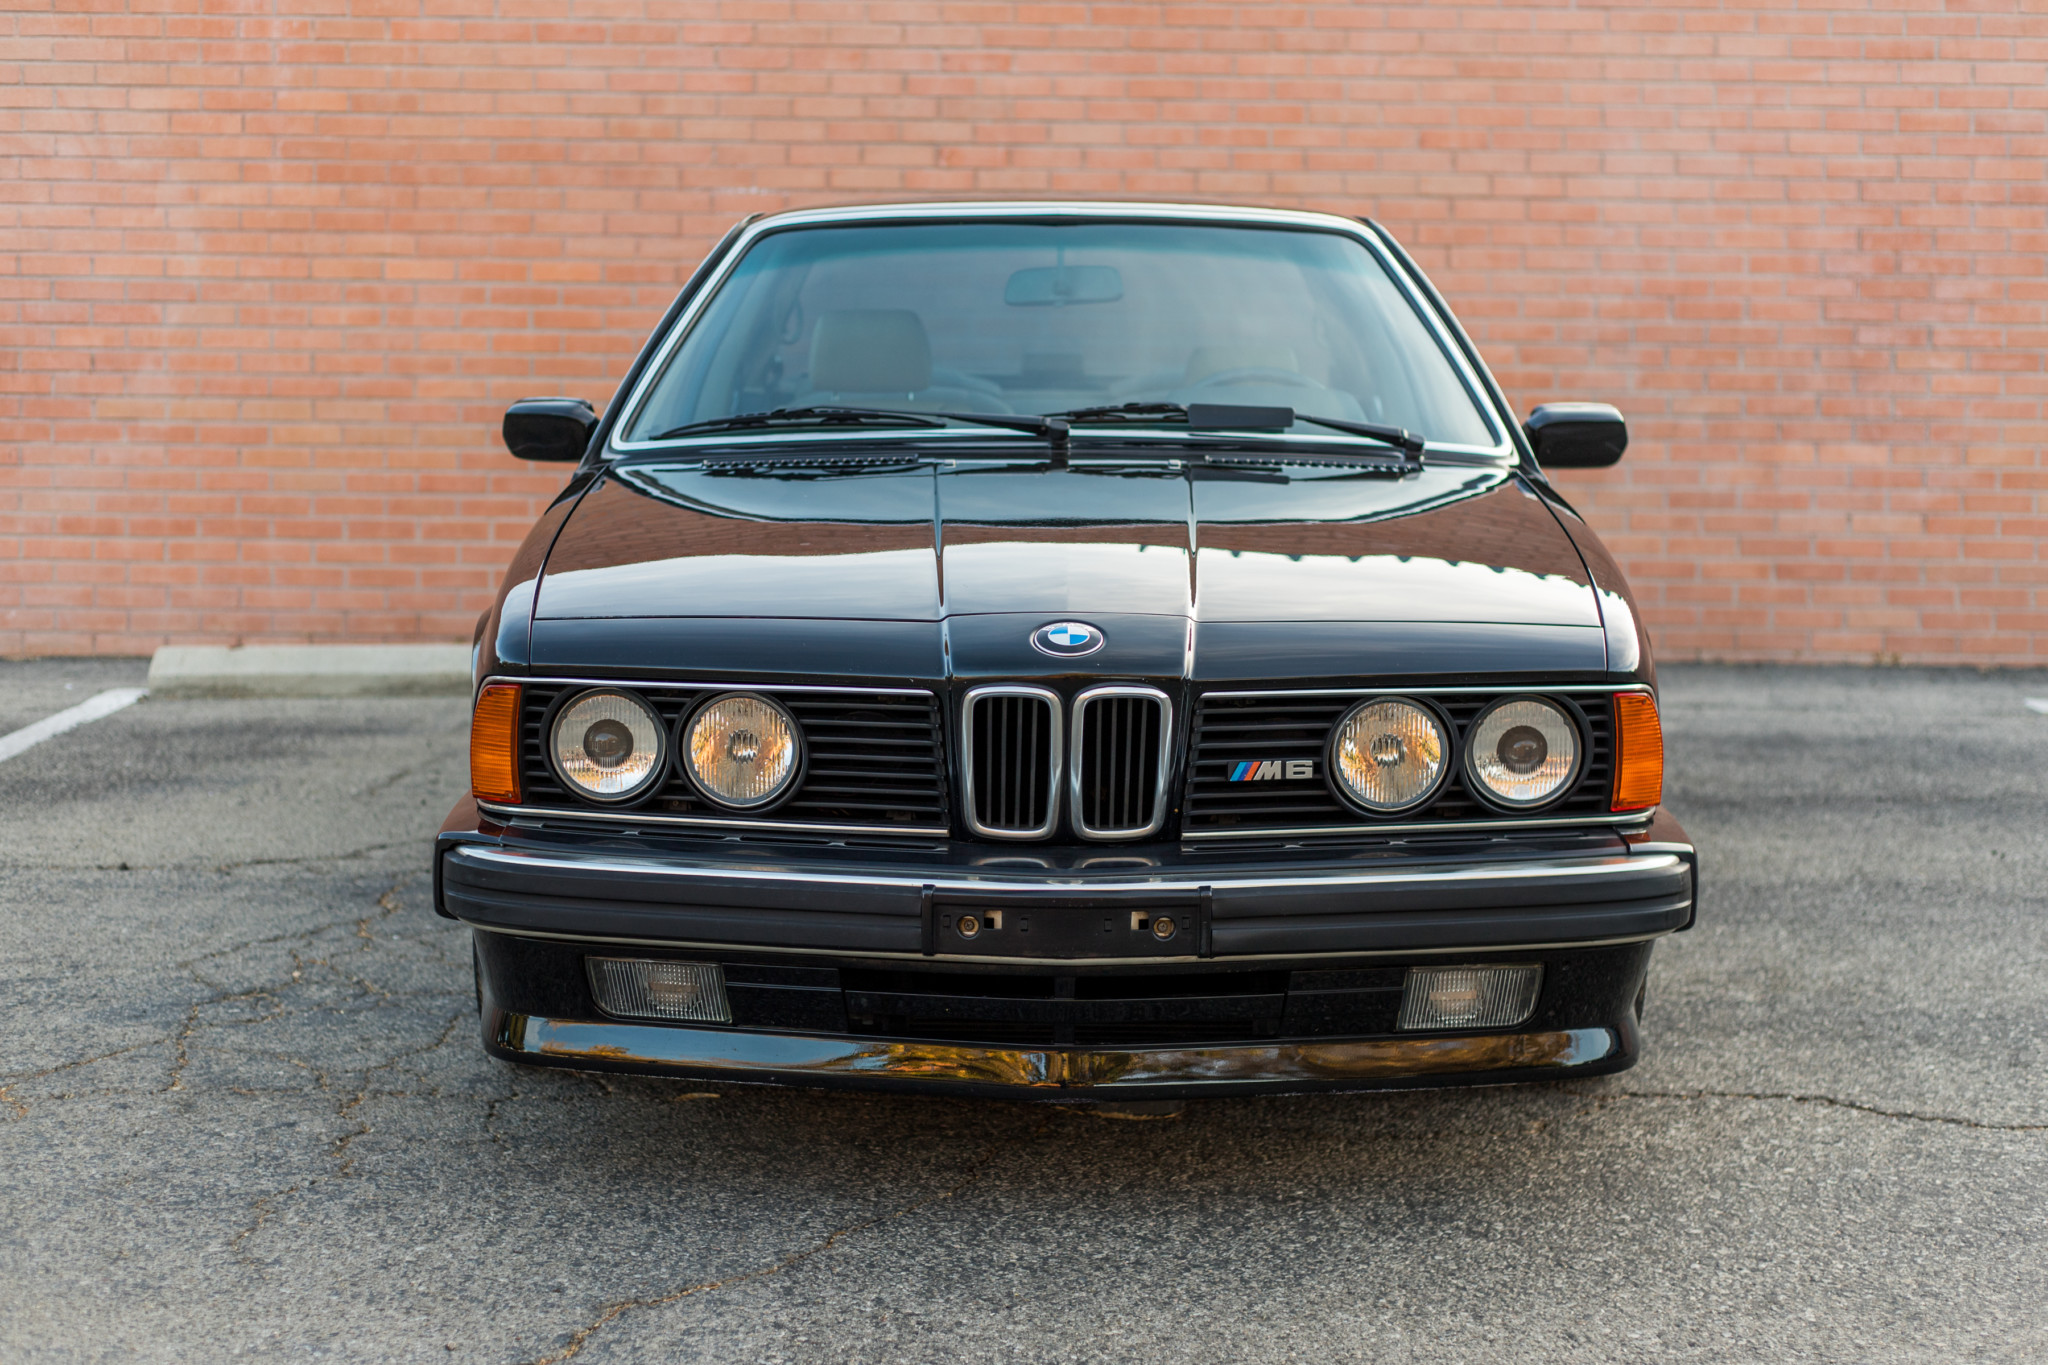 1988 bmw M6 kent classic cars (15).jpg